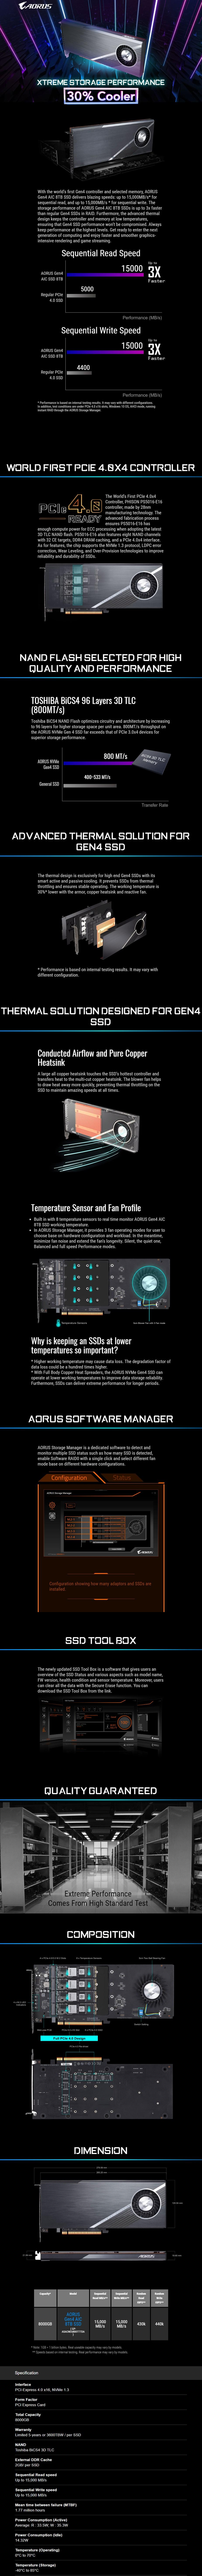 Gigabyte AORUS Gen 4 8TB PCIe NVMe SSD GP-ASACNE6800TTTDA - Overview 1